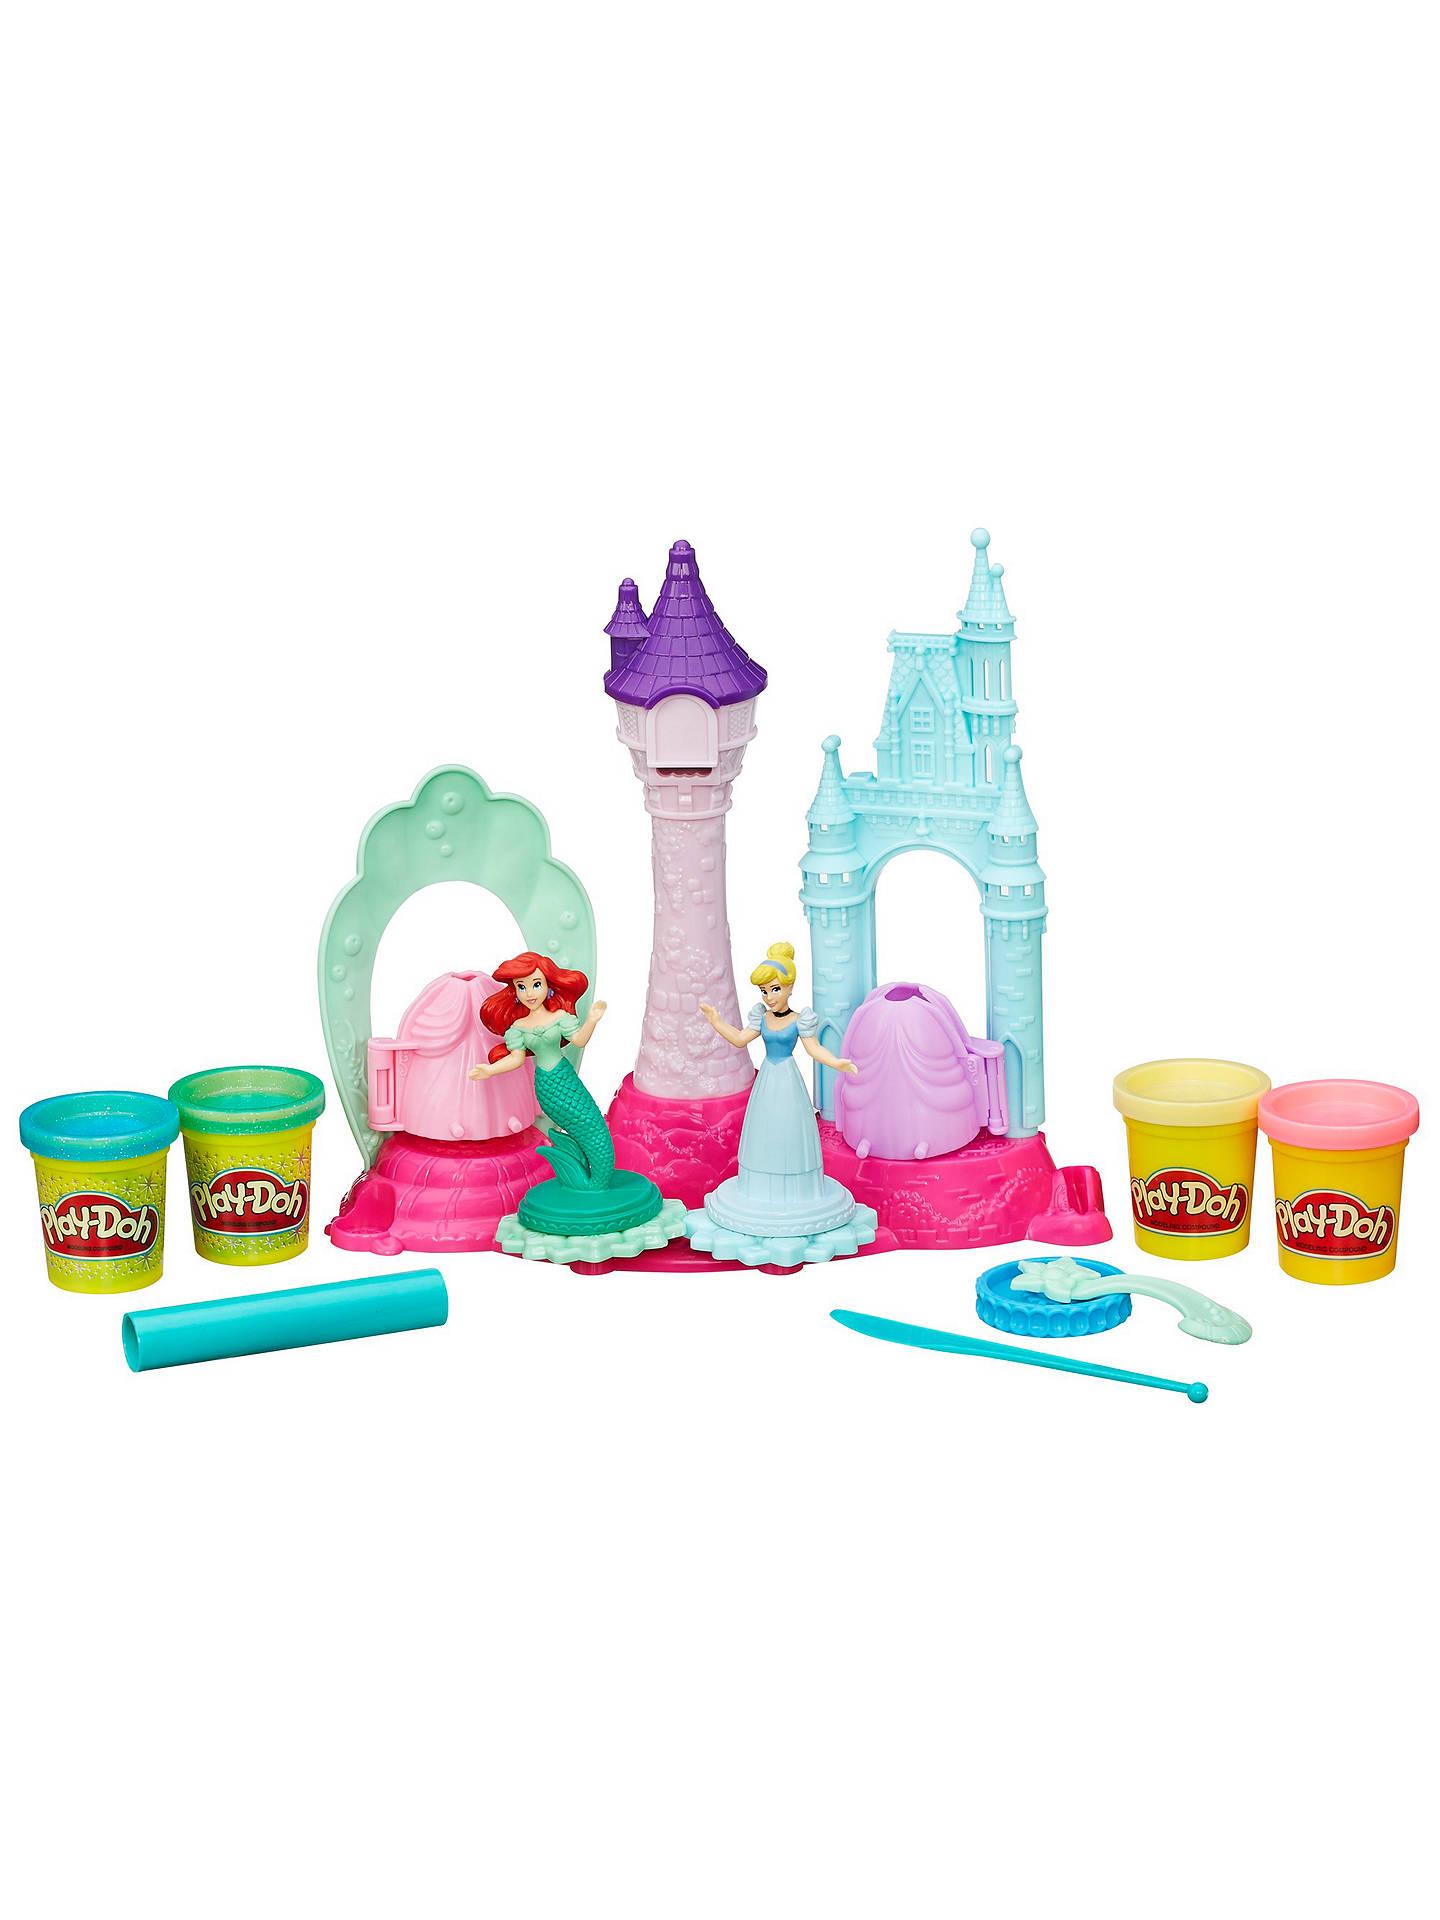 ... BuyPlay-Doh Disney Princess Royal Palace Clay Kit Online at  johnlewis.com ... 1cab466e73583